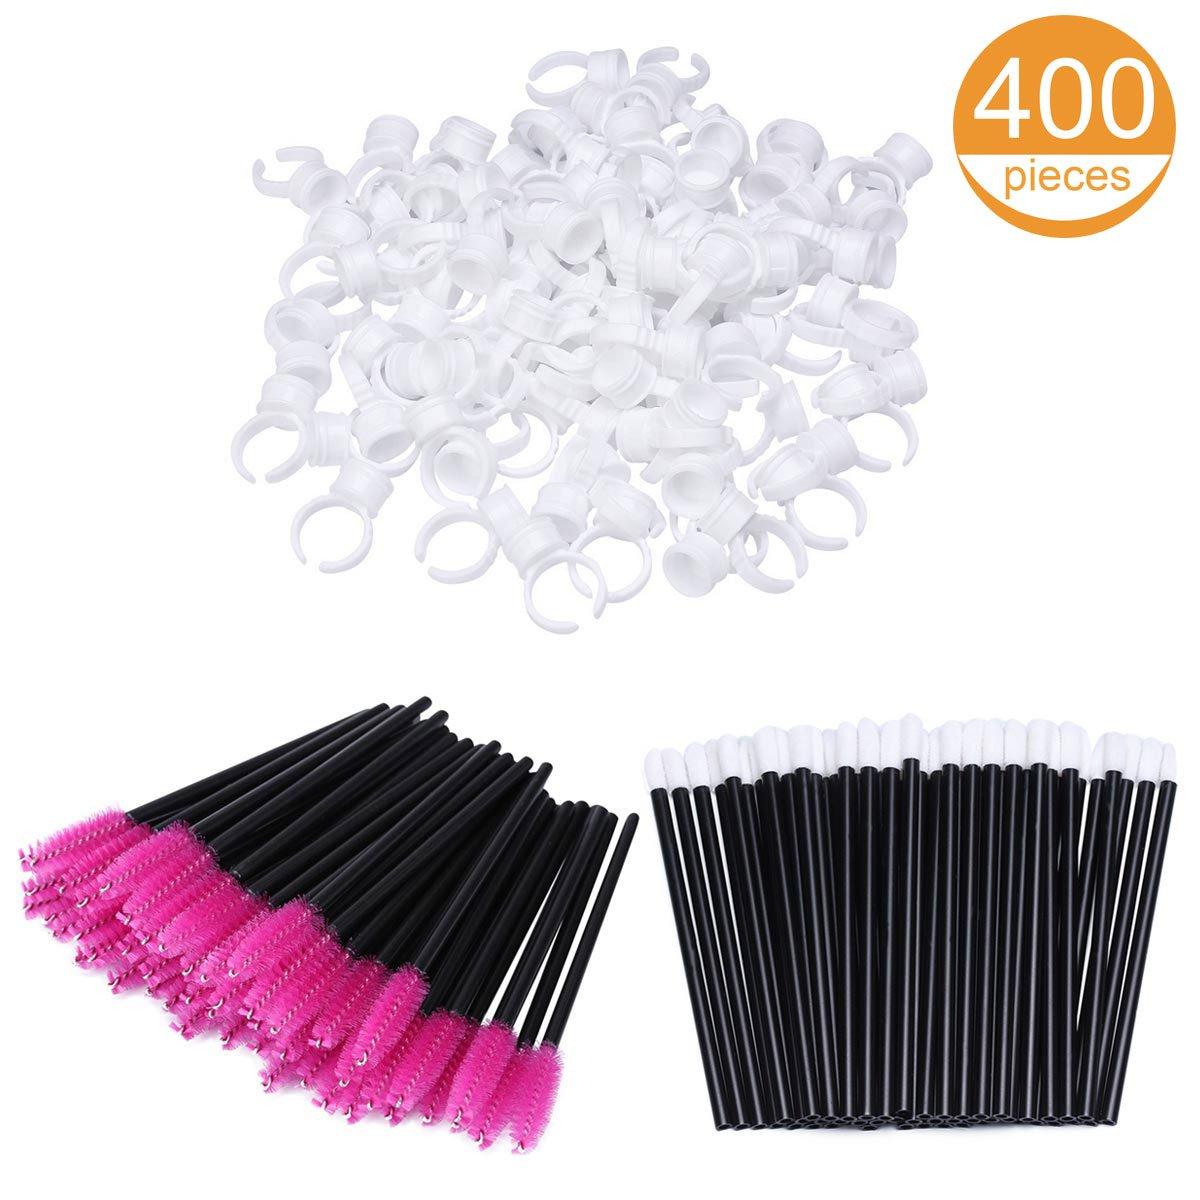 100 Glue Holder Rings Cup 100 Eyeliner Brushes Eyelash Mascara Wands and 200 Lipstick Brush Gloss Wands Applicator